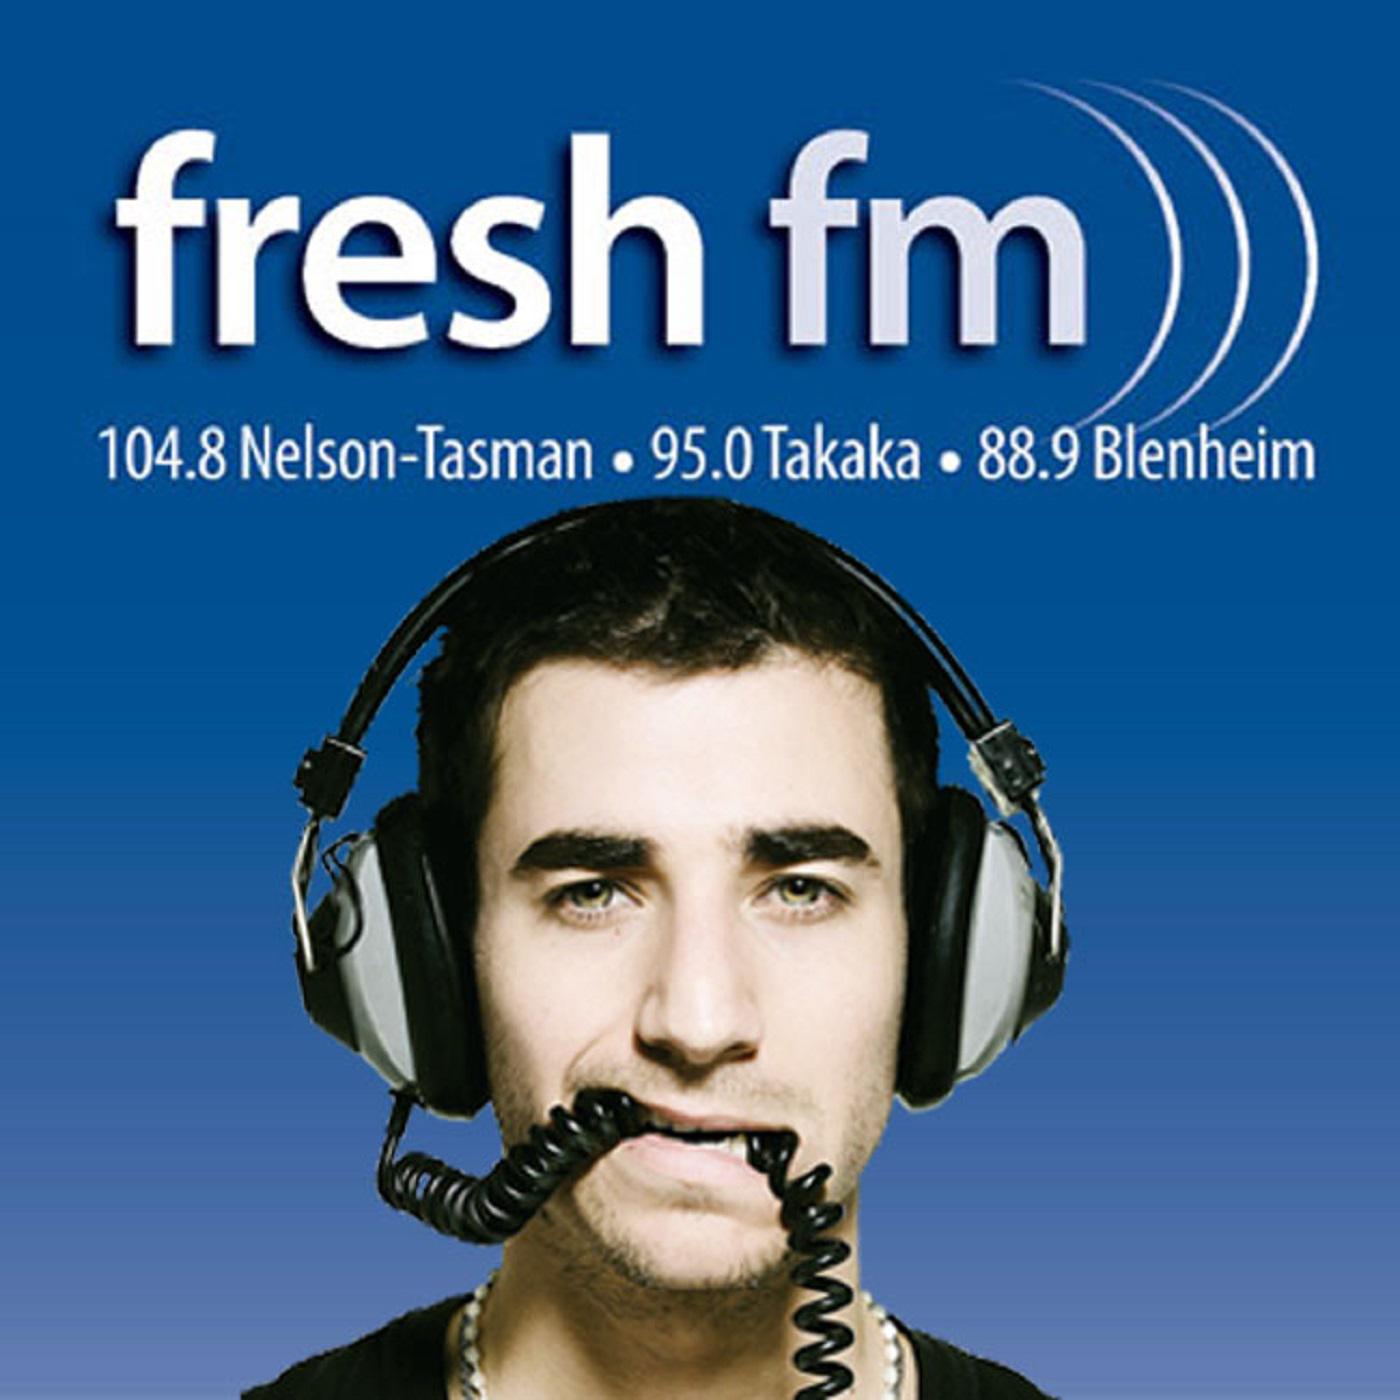 https://static.accessradio.org/StationFolder/freshfm/Images/Fresh-FM-Art140078.png